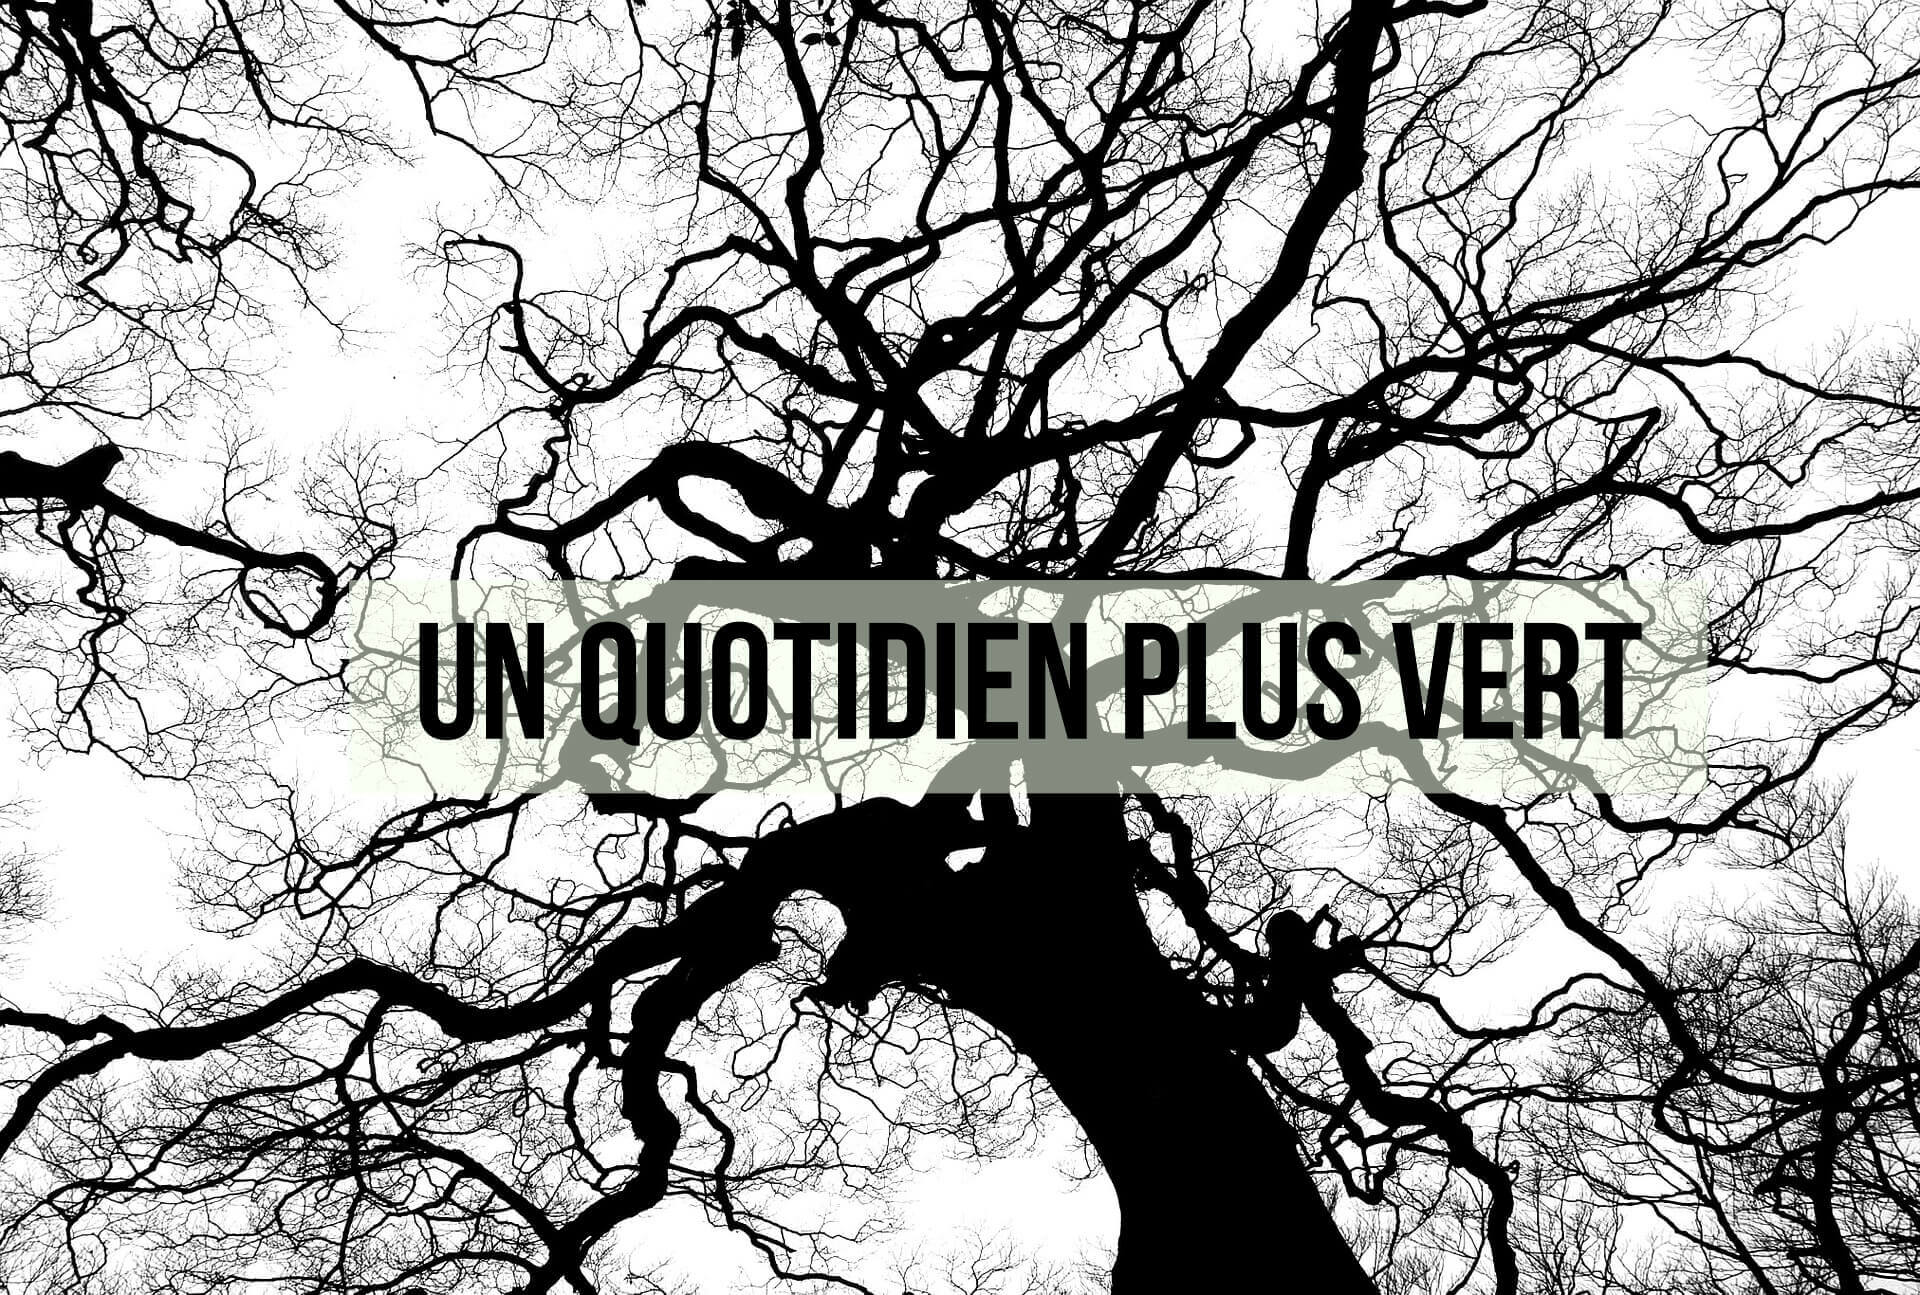 tree-894903_1920